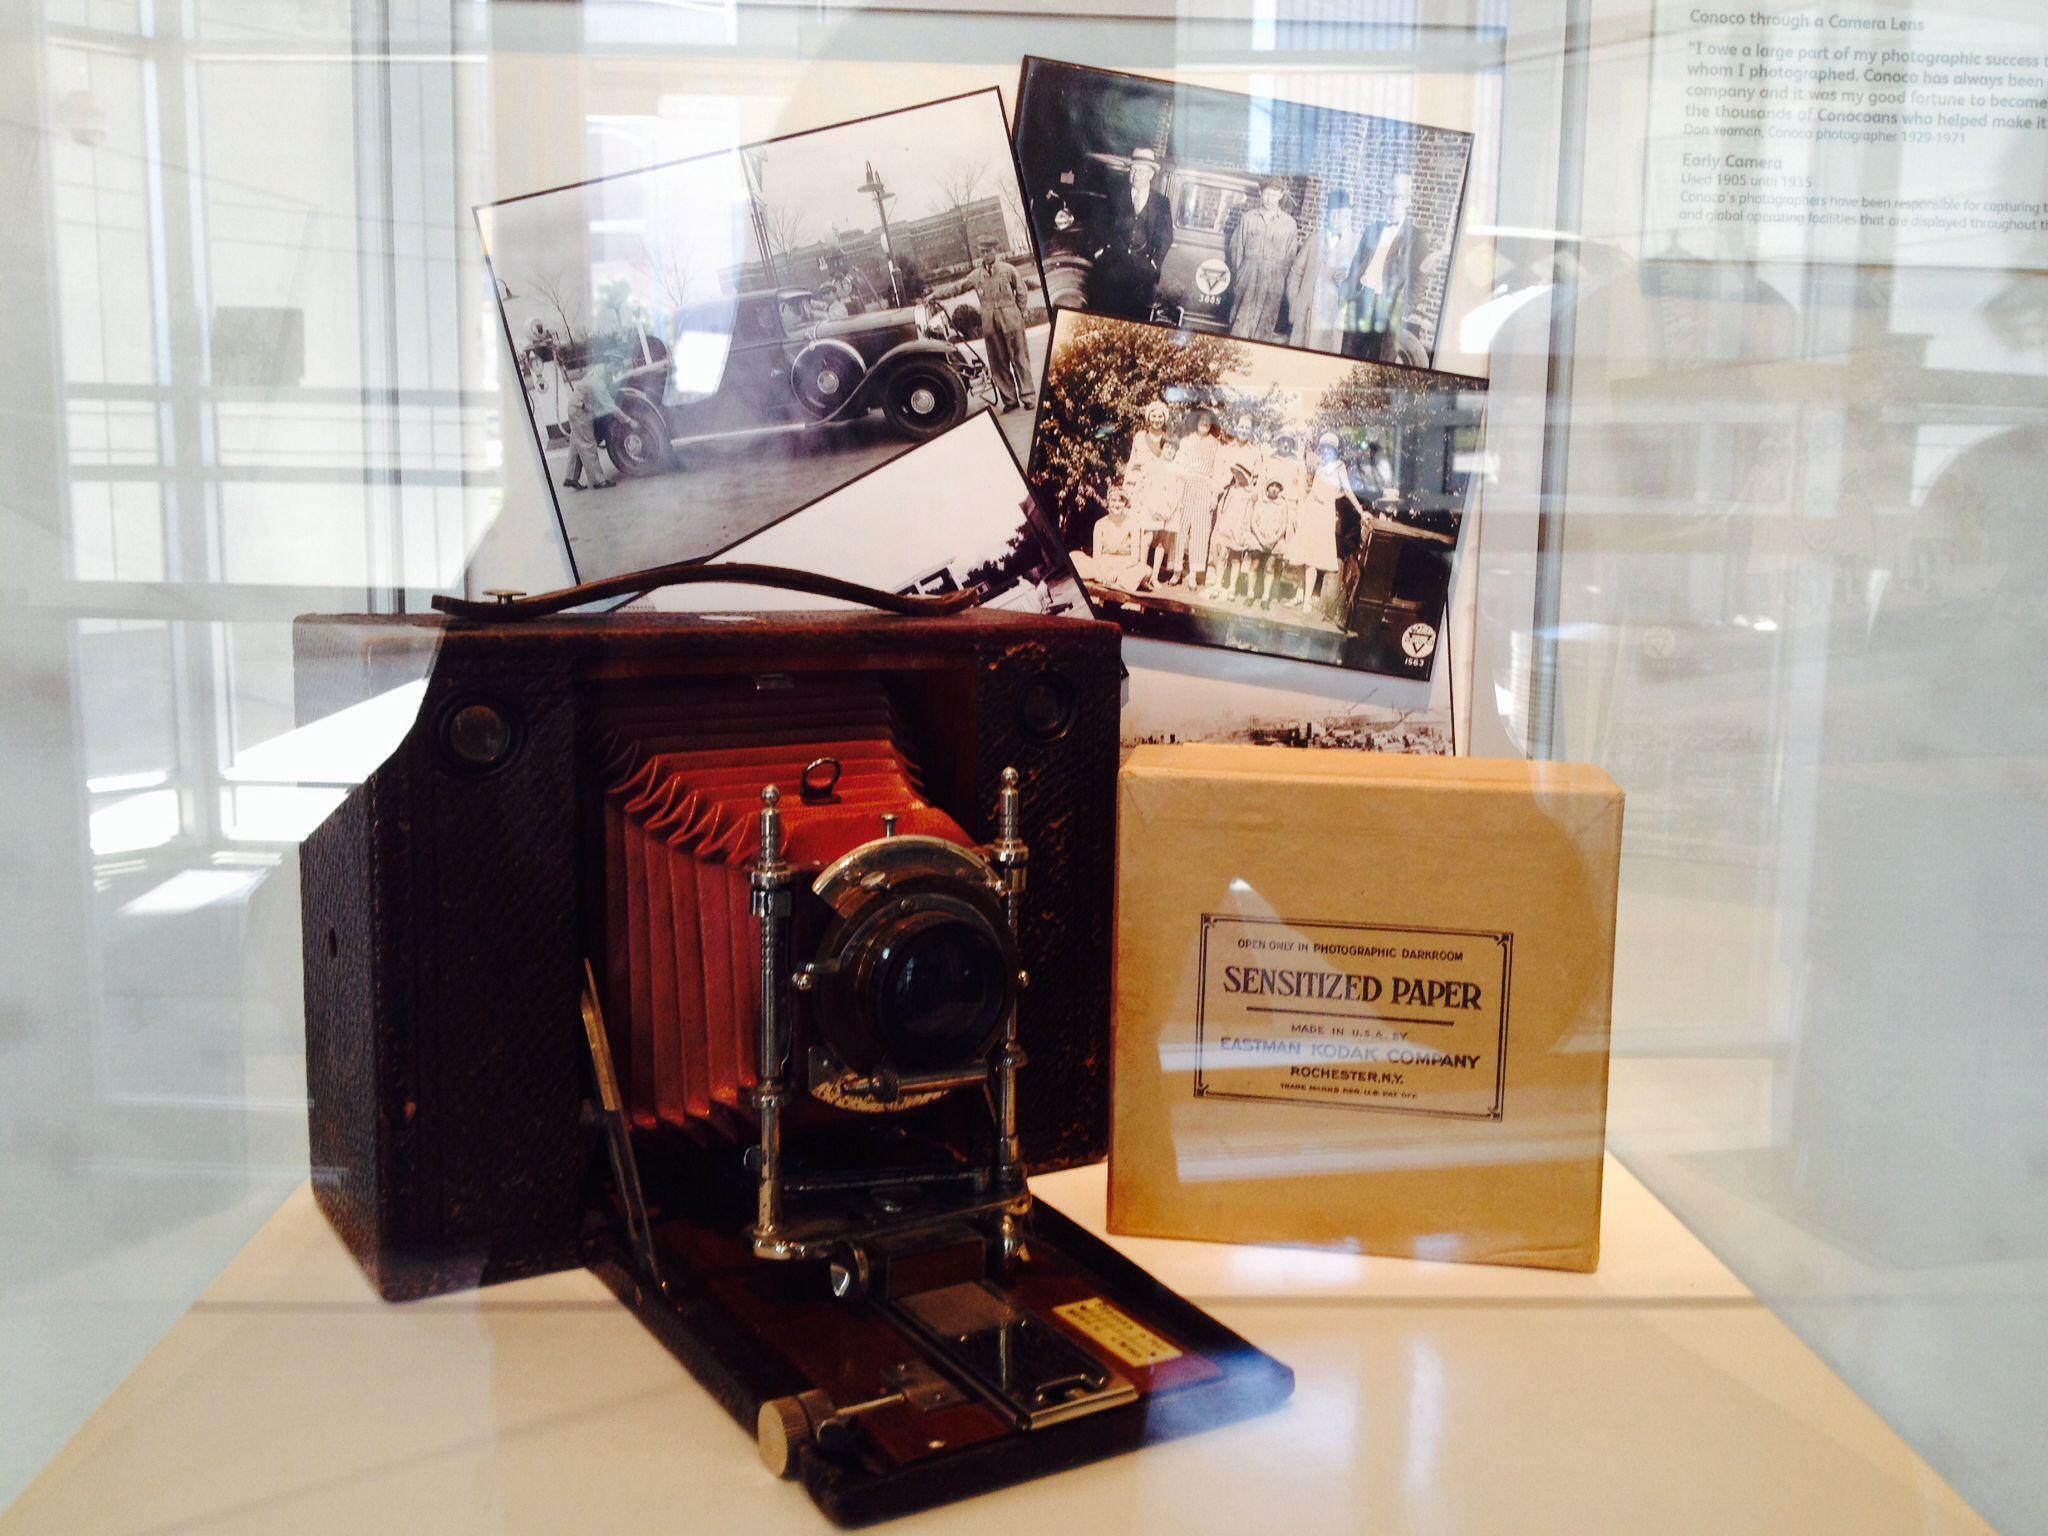 Conoco photography equipment for marketing Ponca city